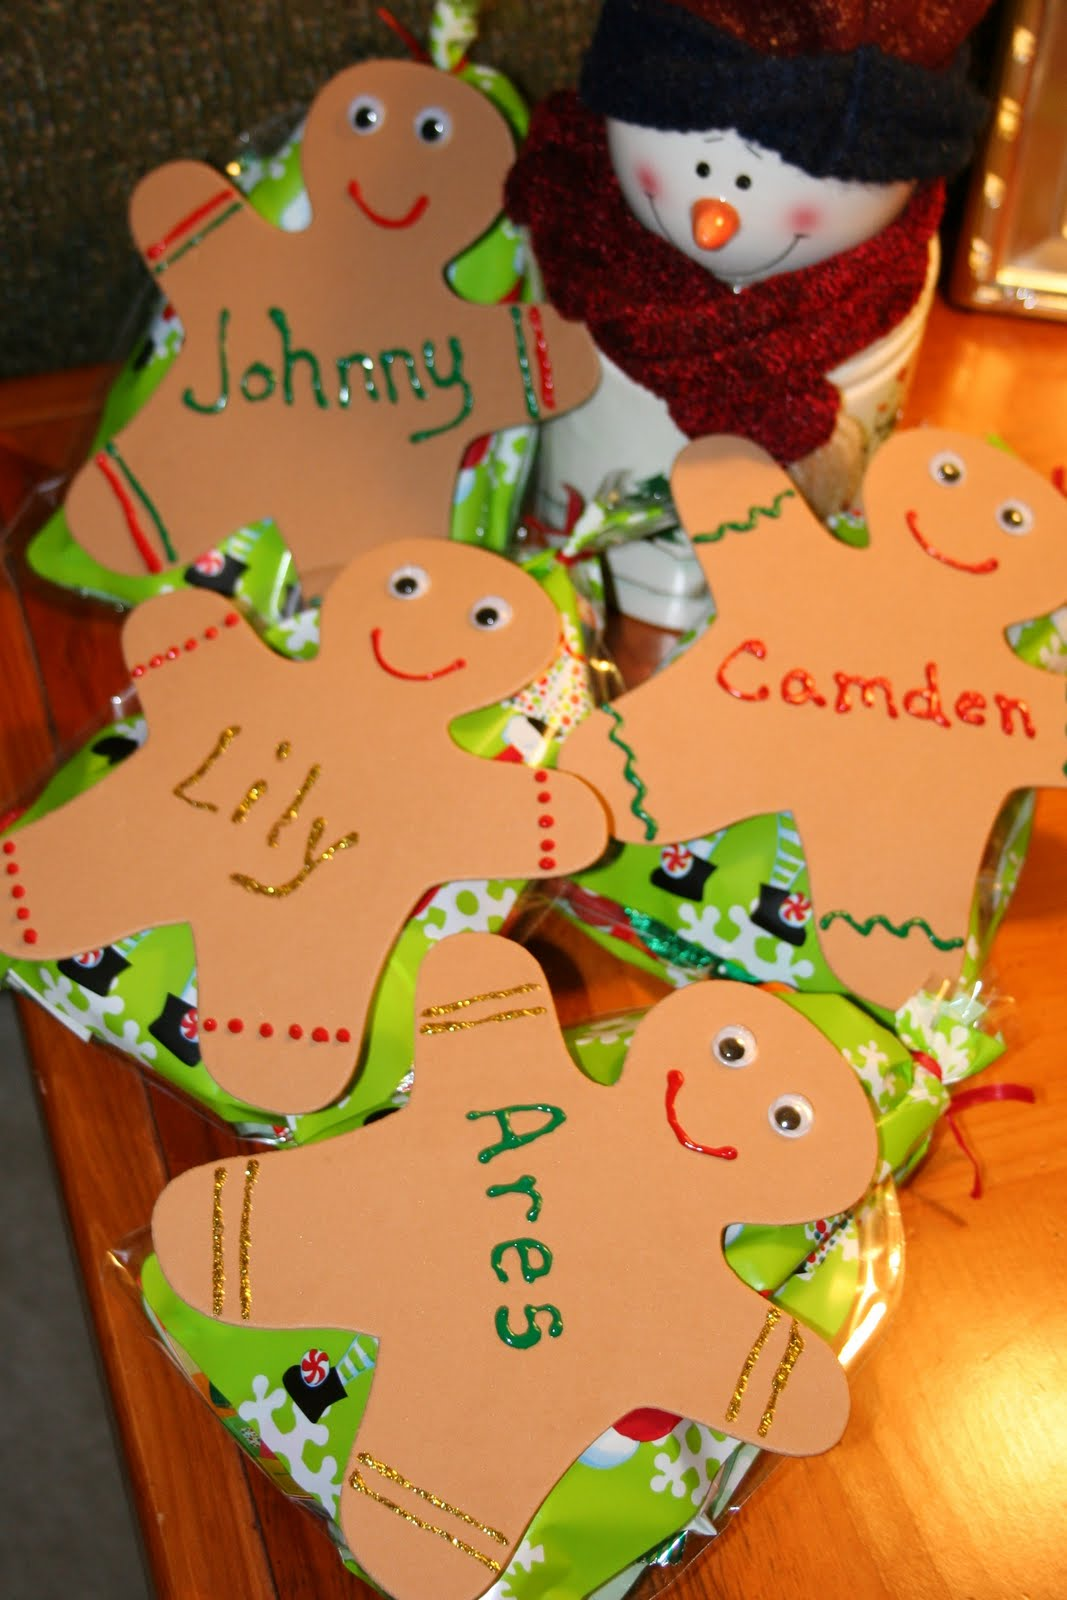 The Logan S Preschool Christmas Party